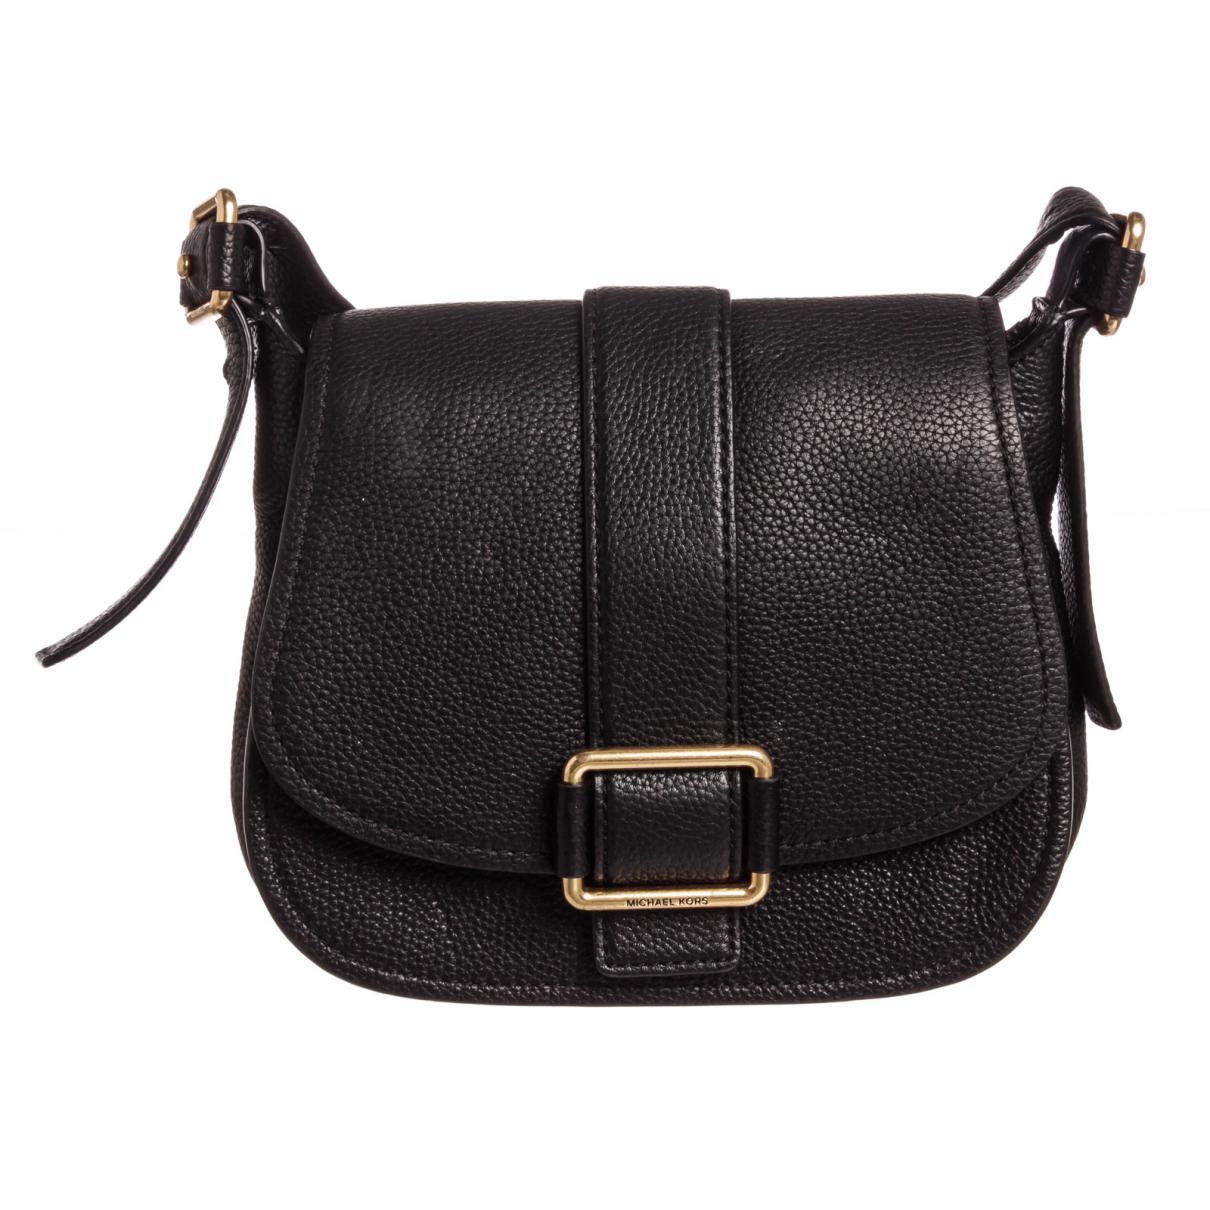 Michael Kors Pre-owned - Leather handbag Y9PFGz